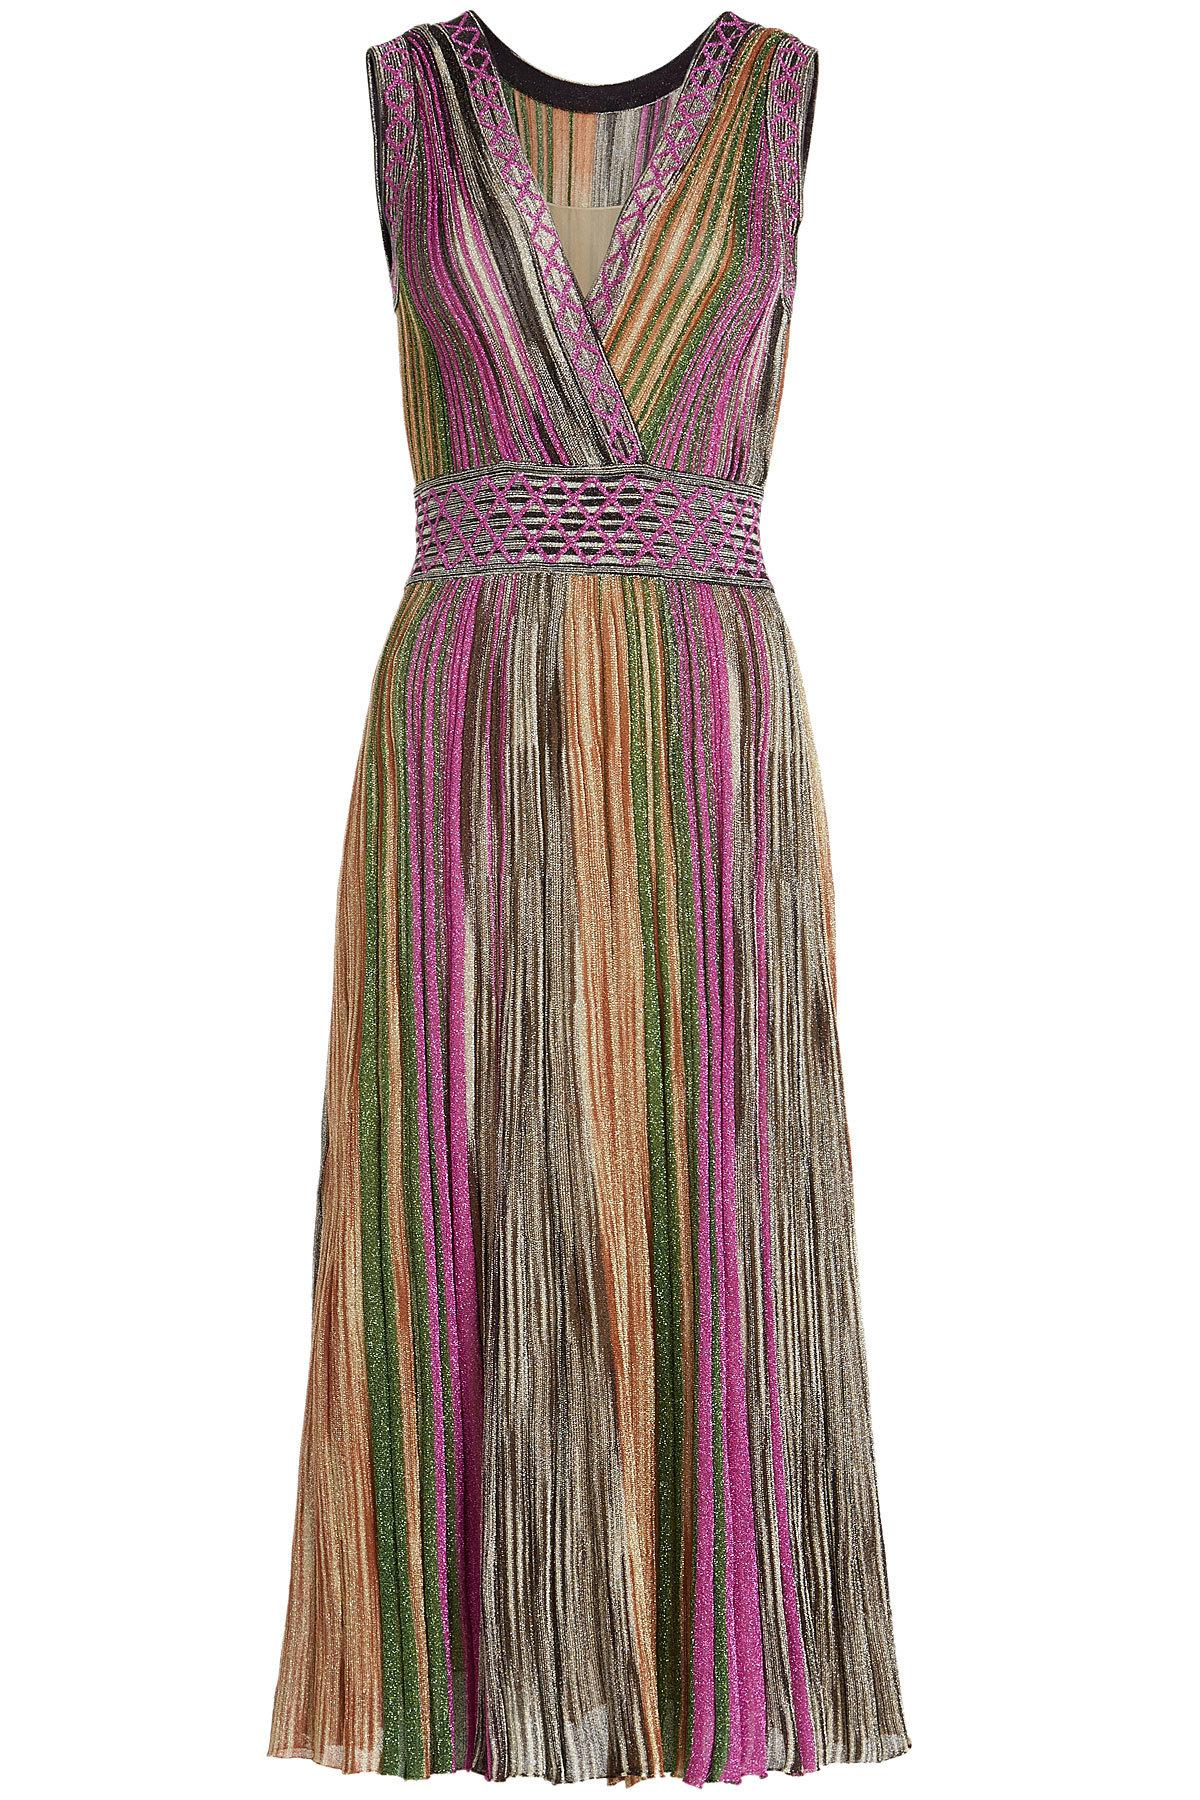 72c323c8a9d28 Missoni V-neck Dress With Metallic Thread - Lyst